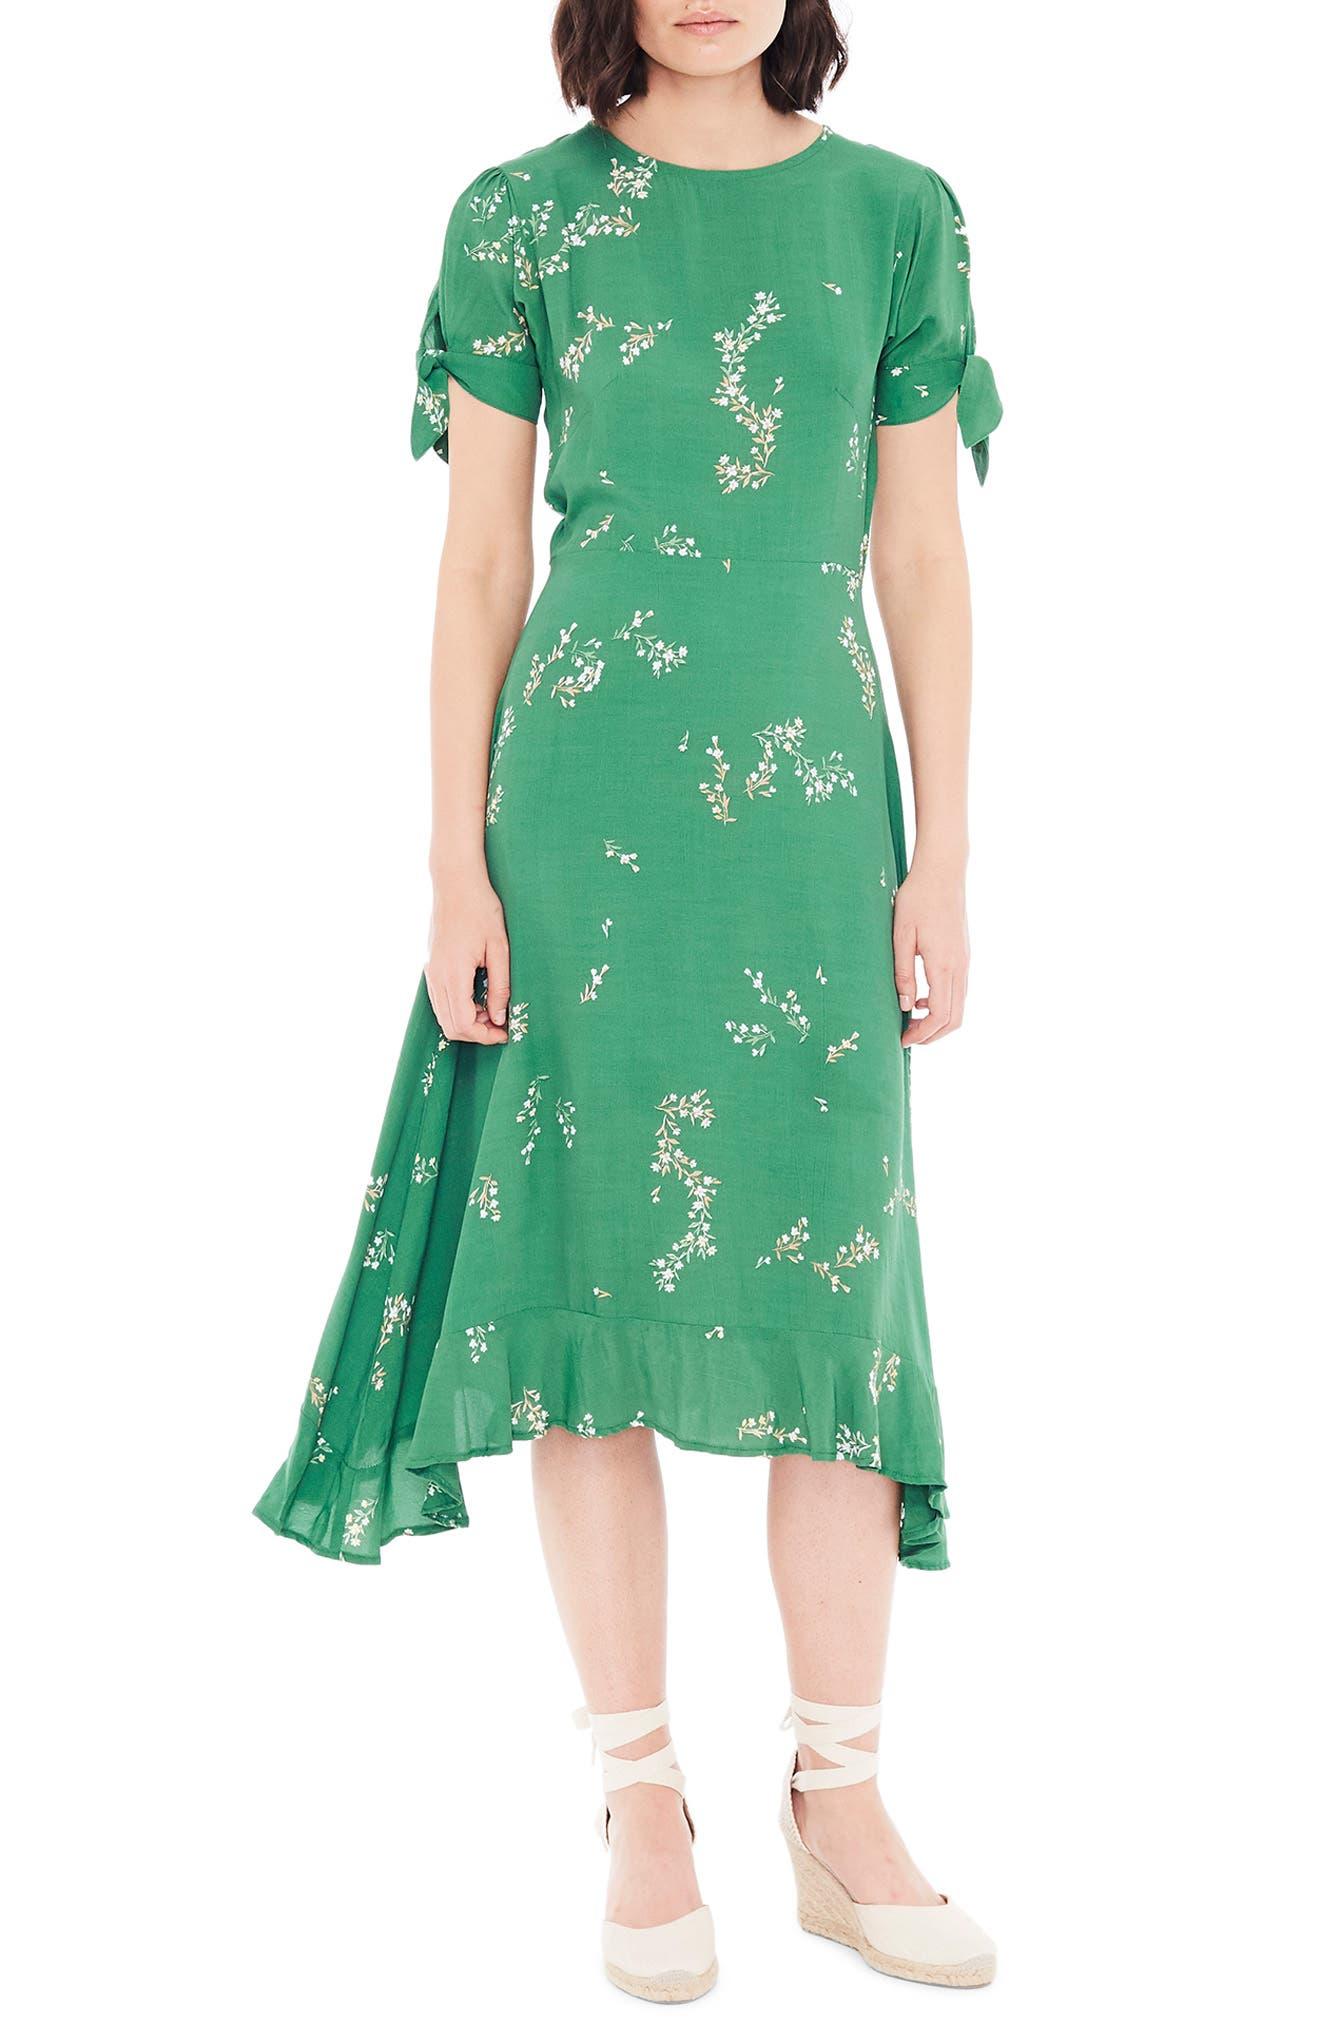 FAITHFULL THE BRAND Emilia Floral Midi Dress, Main, color, MYRTILLE FLORAL PRINT - GREEN